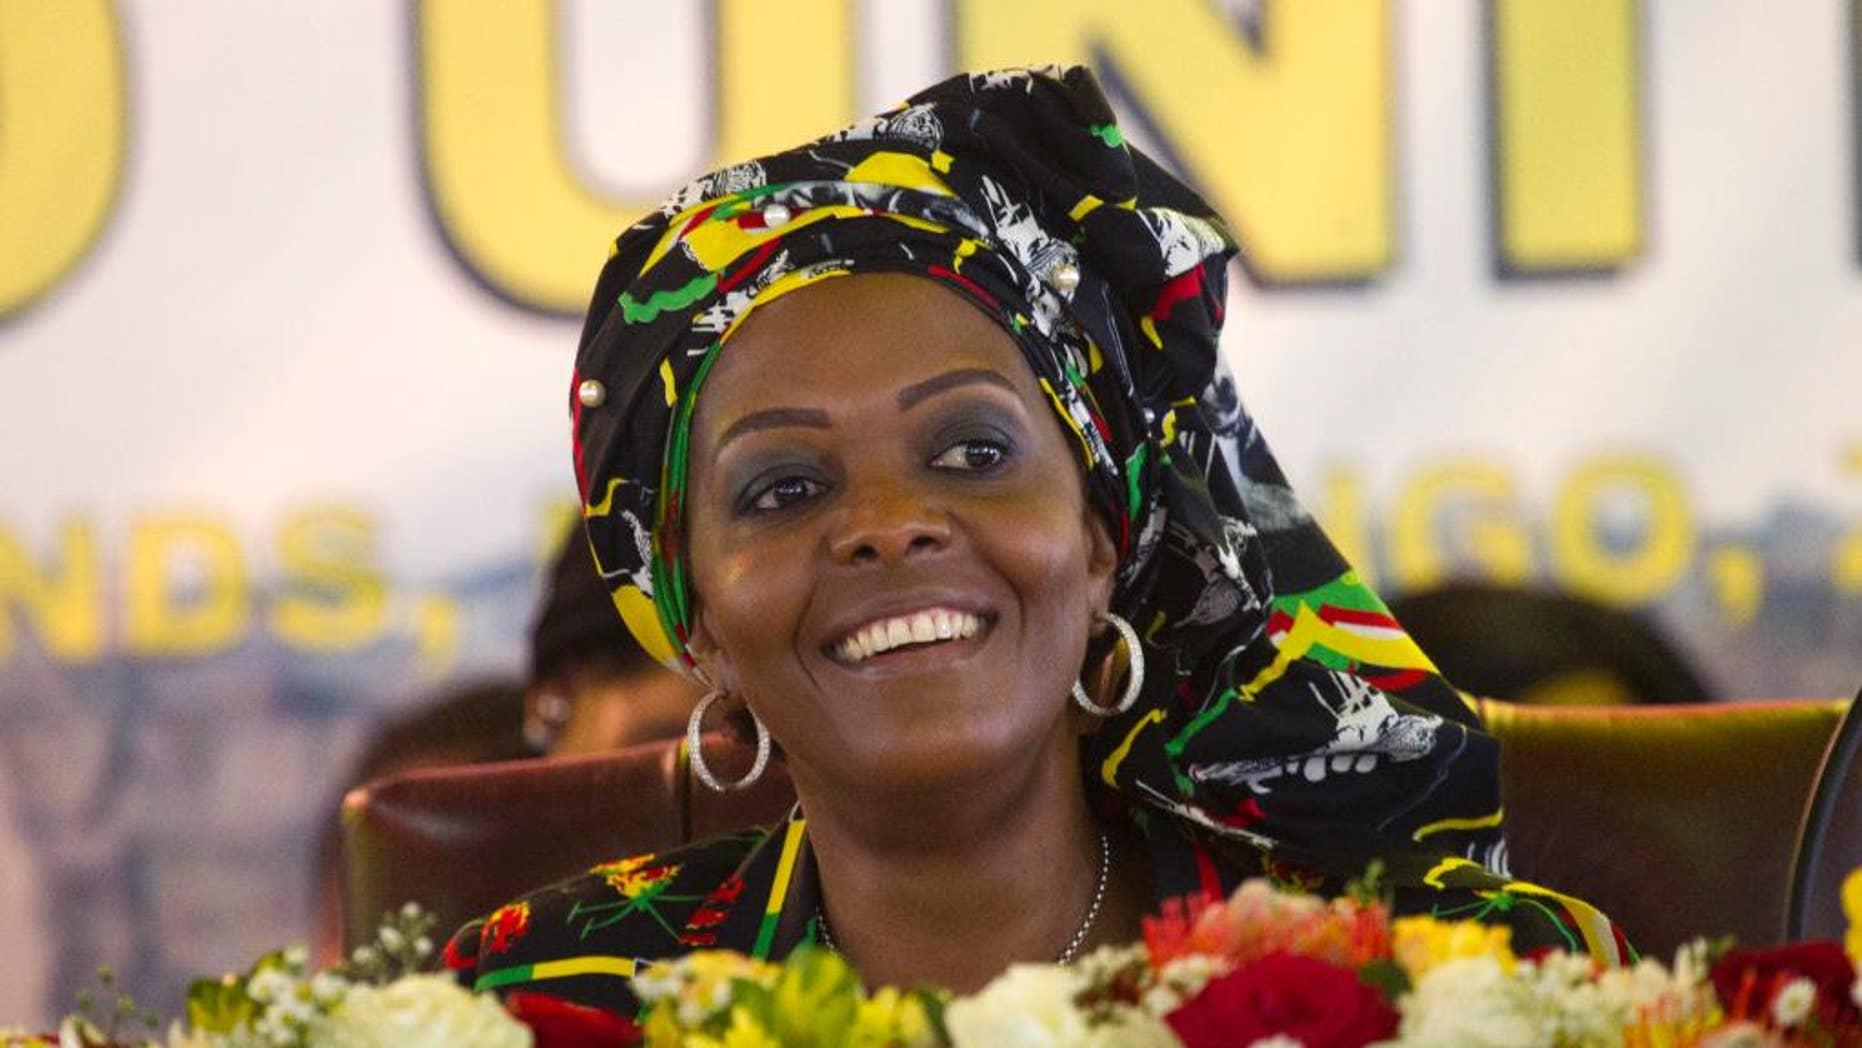 An arrest warrant has been issued for former Zimbabwean first lady Grace Mugabe for an alleged assault of a model inside a Johannesburg hotel room in 2017. (AP Photo/Tsvangirayi Mukwazhi)